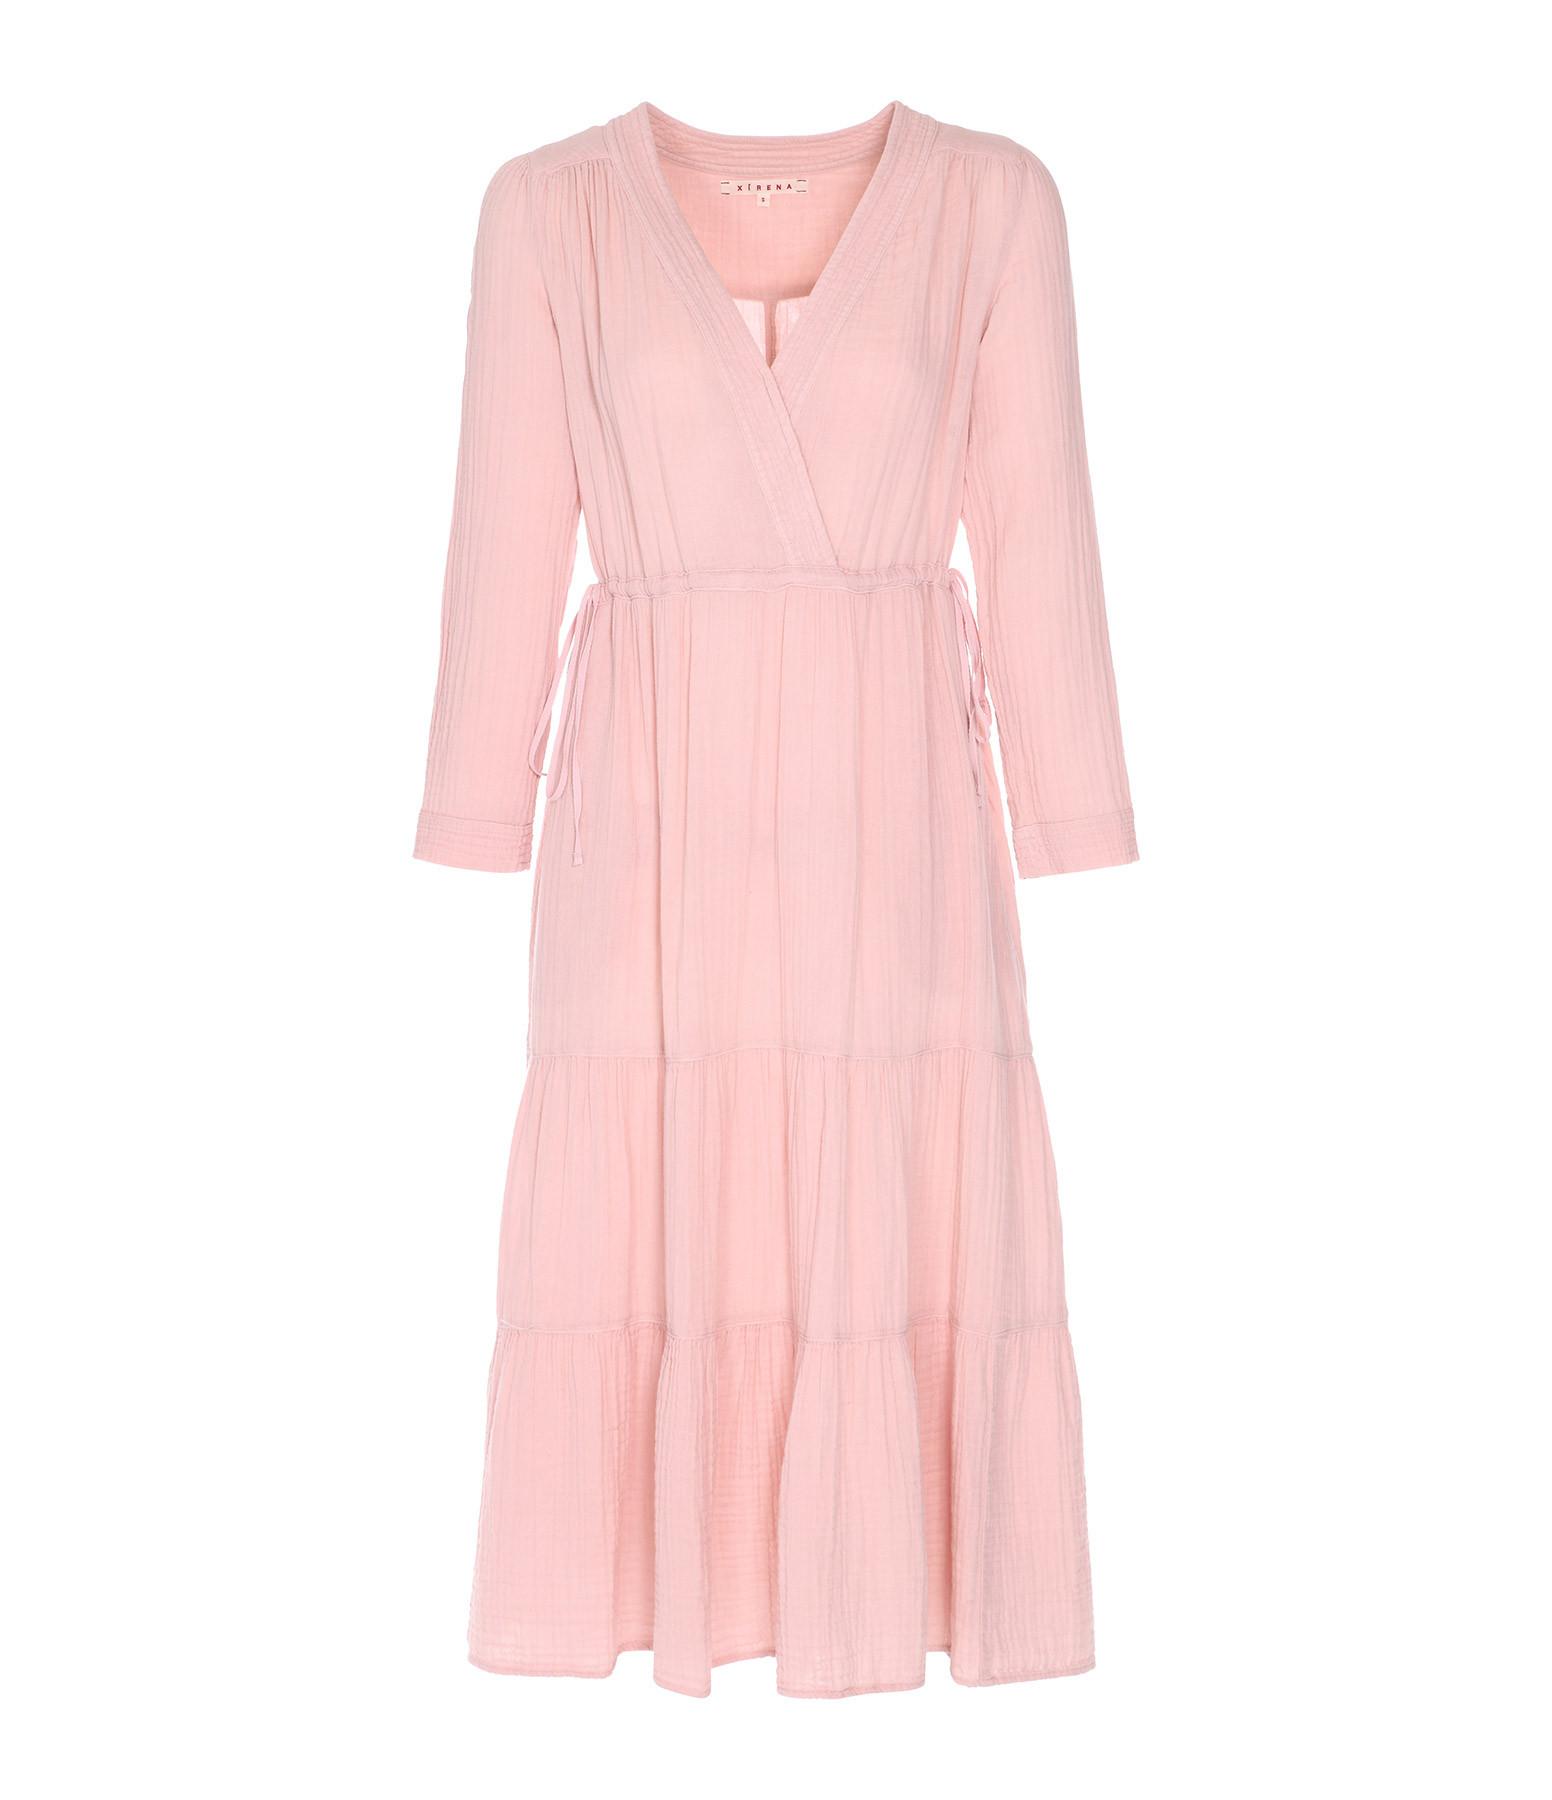 XIRENA - Robe Chelsea Gauze Everly Rose